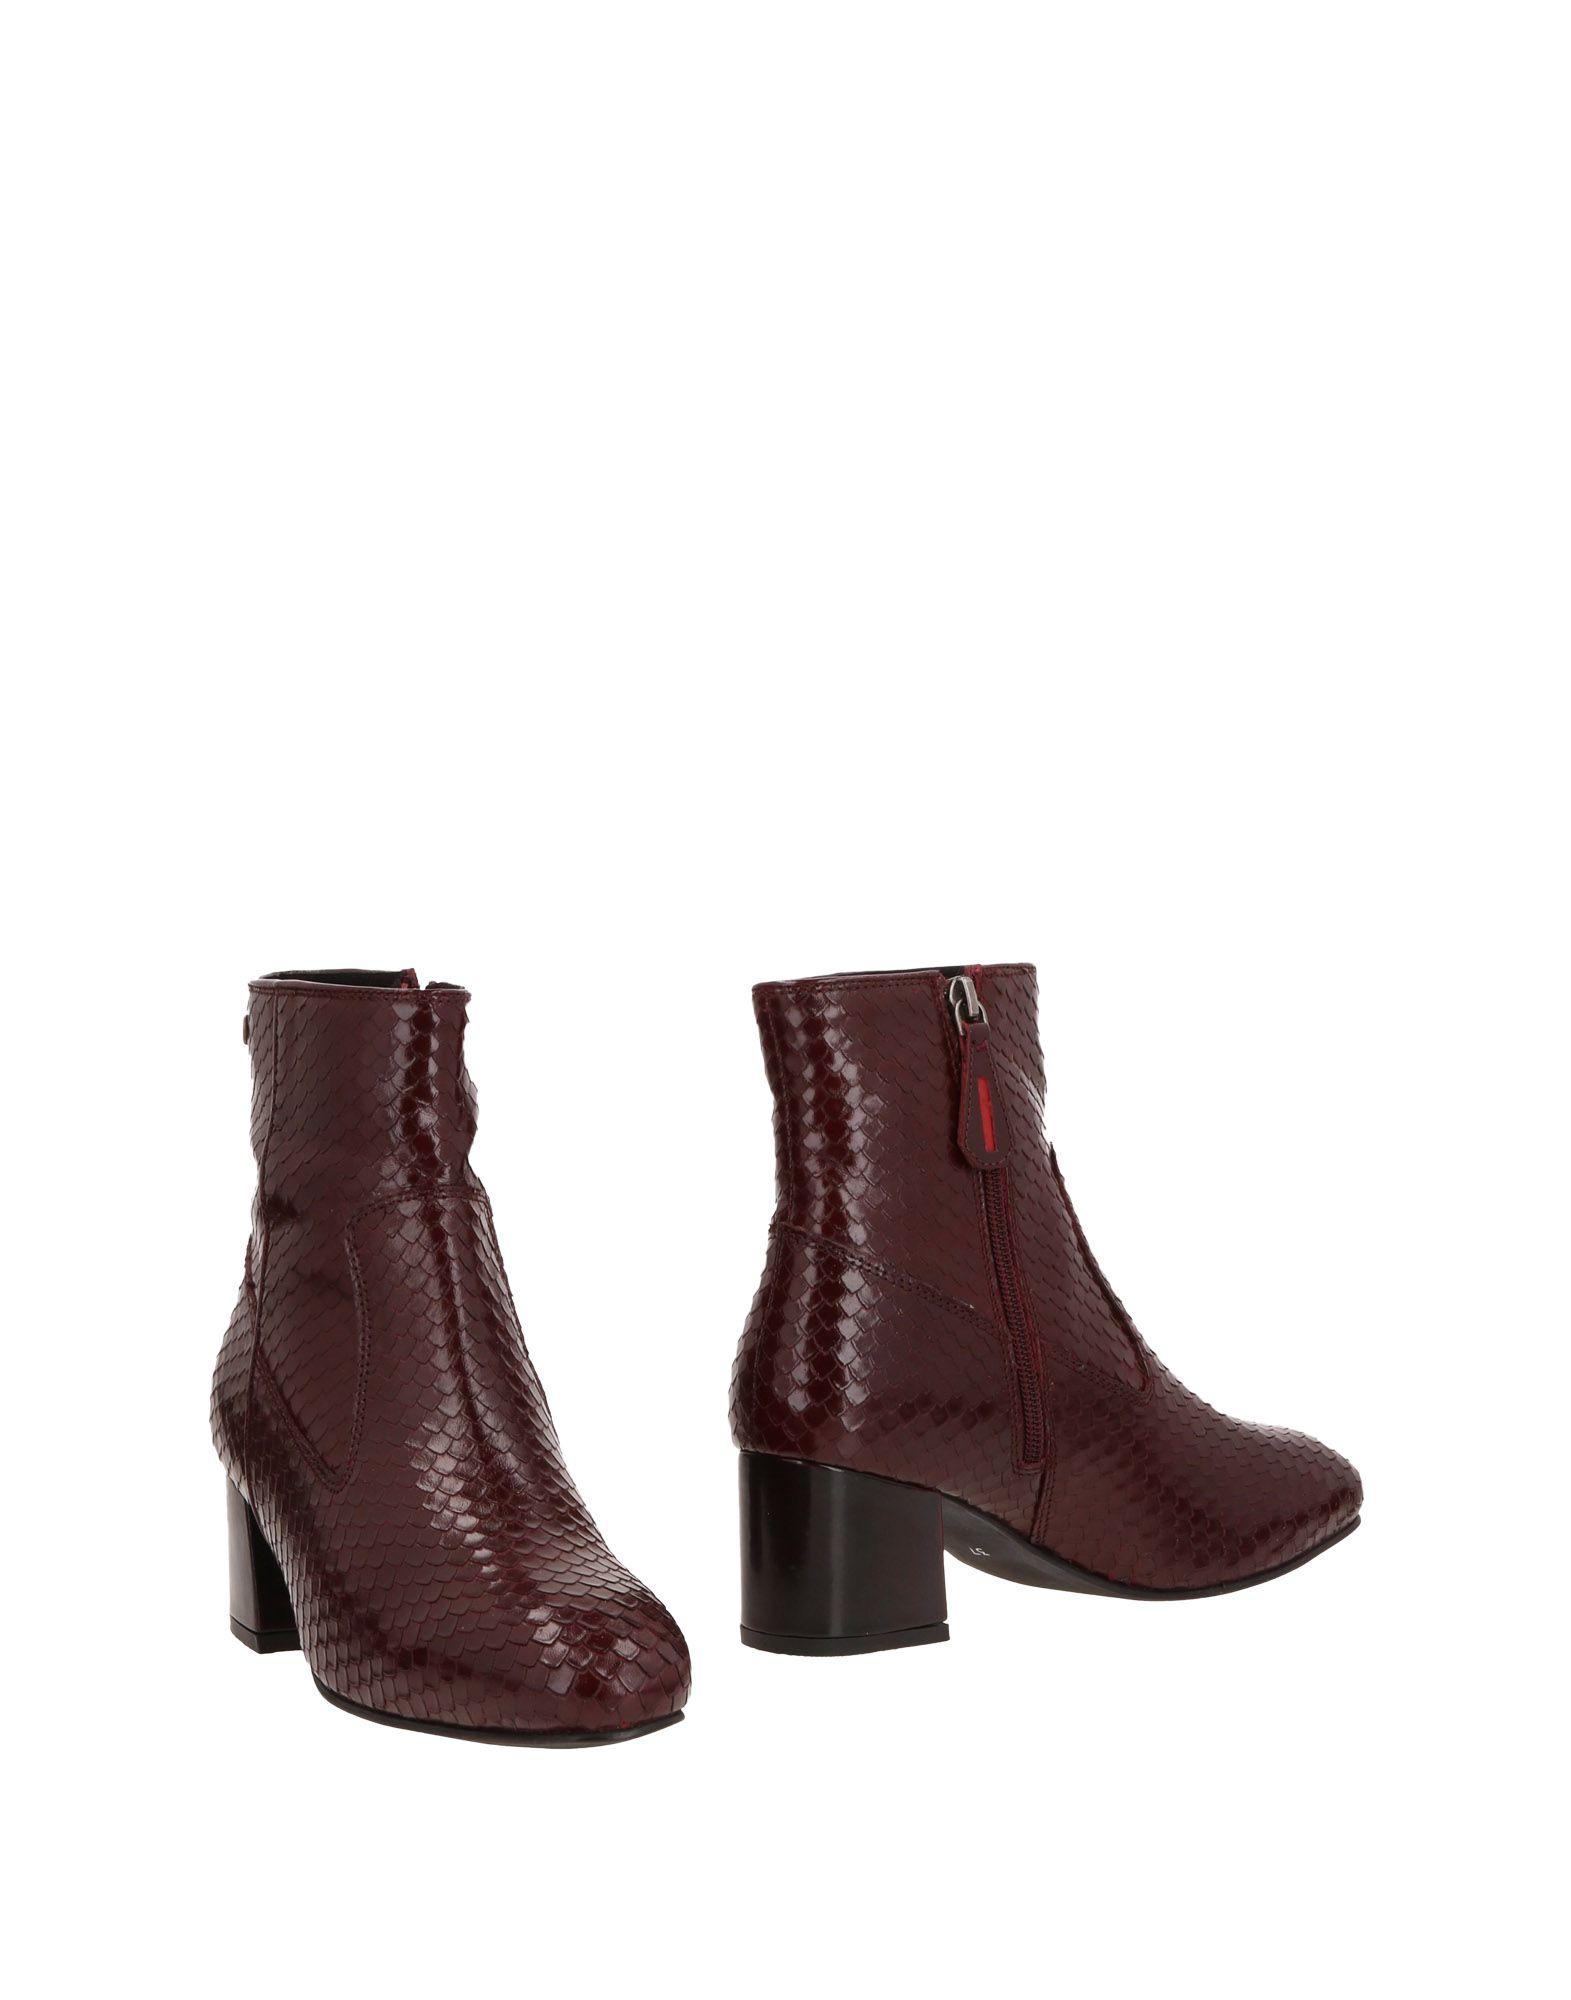 Gioseppo Stiefelette Qualität Damen  11461232JI Gute Qualität Stiefelette beliebte Schuhe 194be5